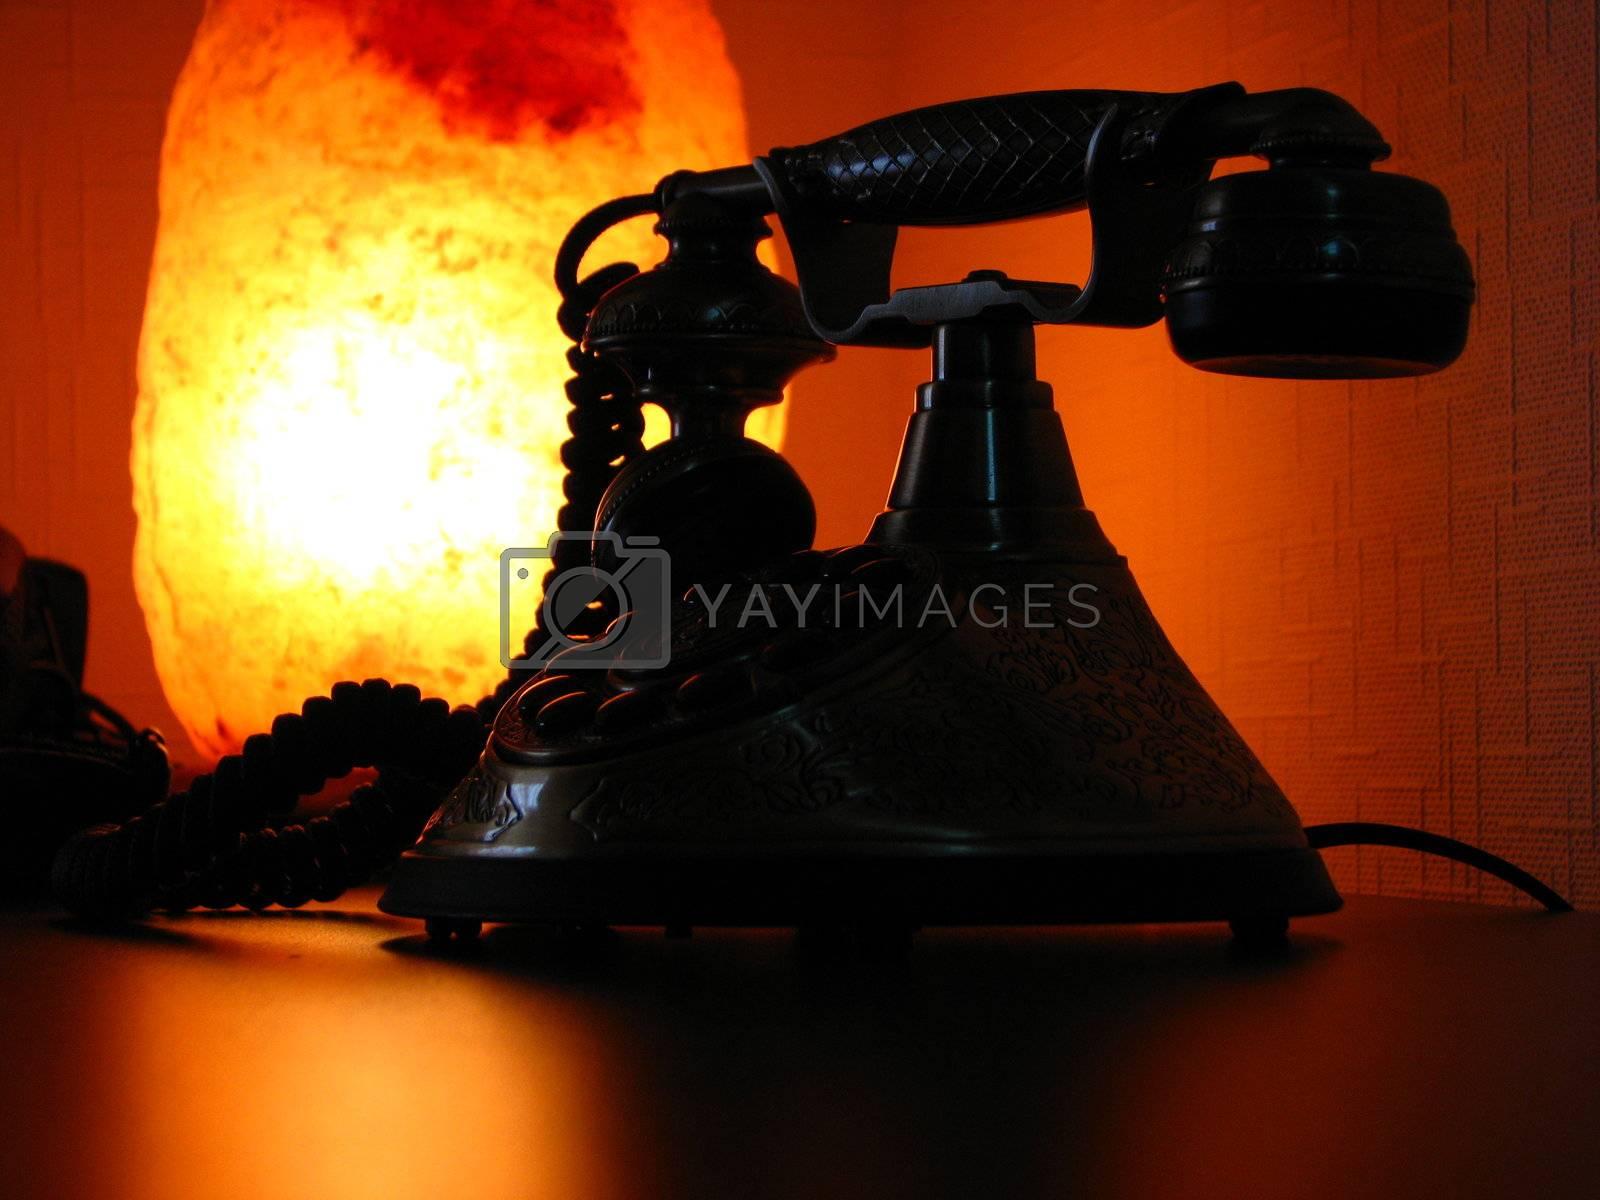 Retro phone and light